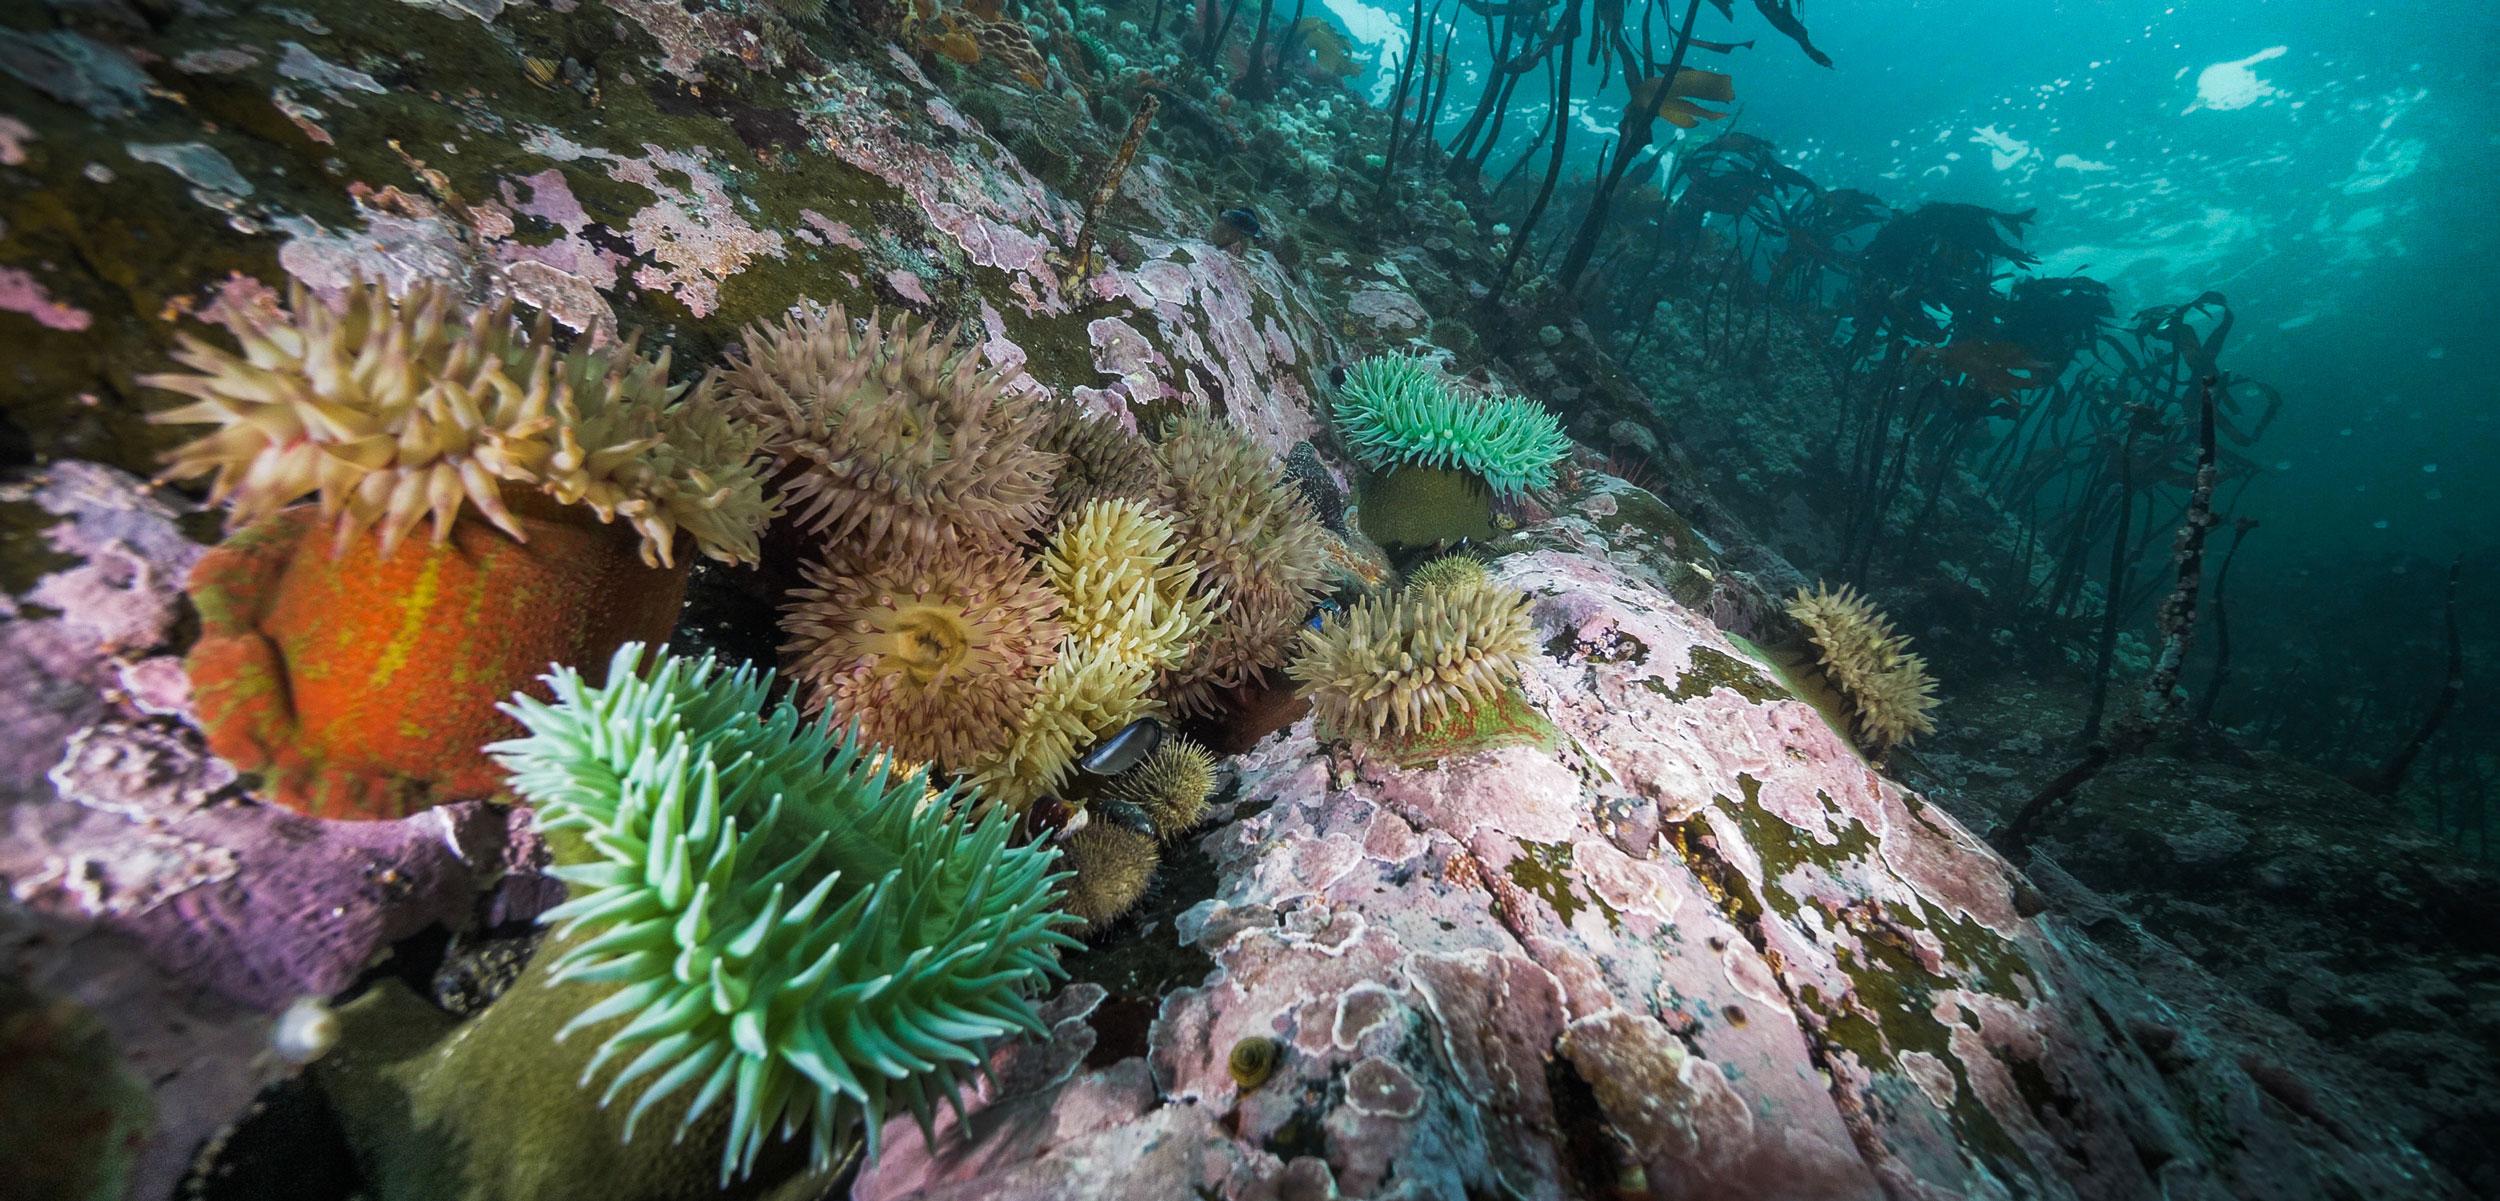 anemones underwater on the British Columbia coast